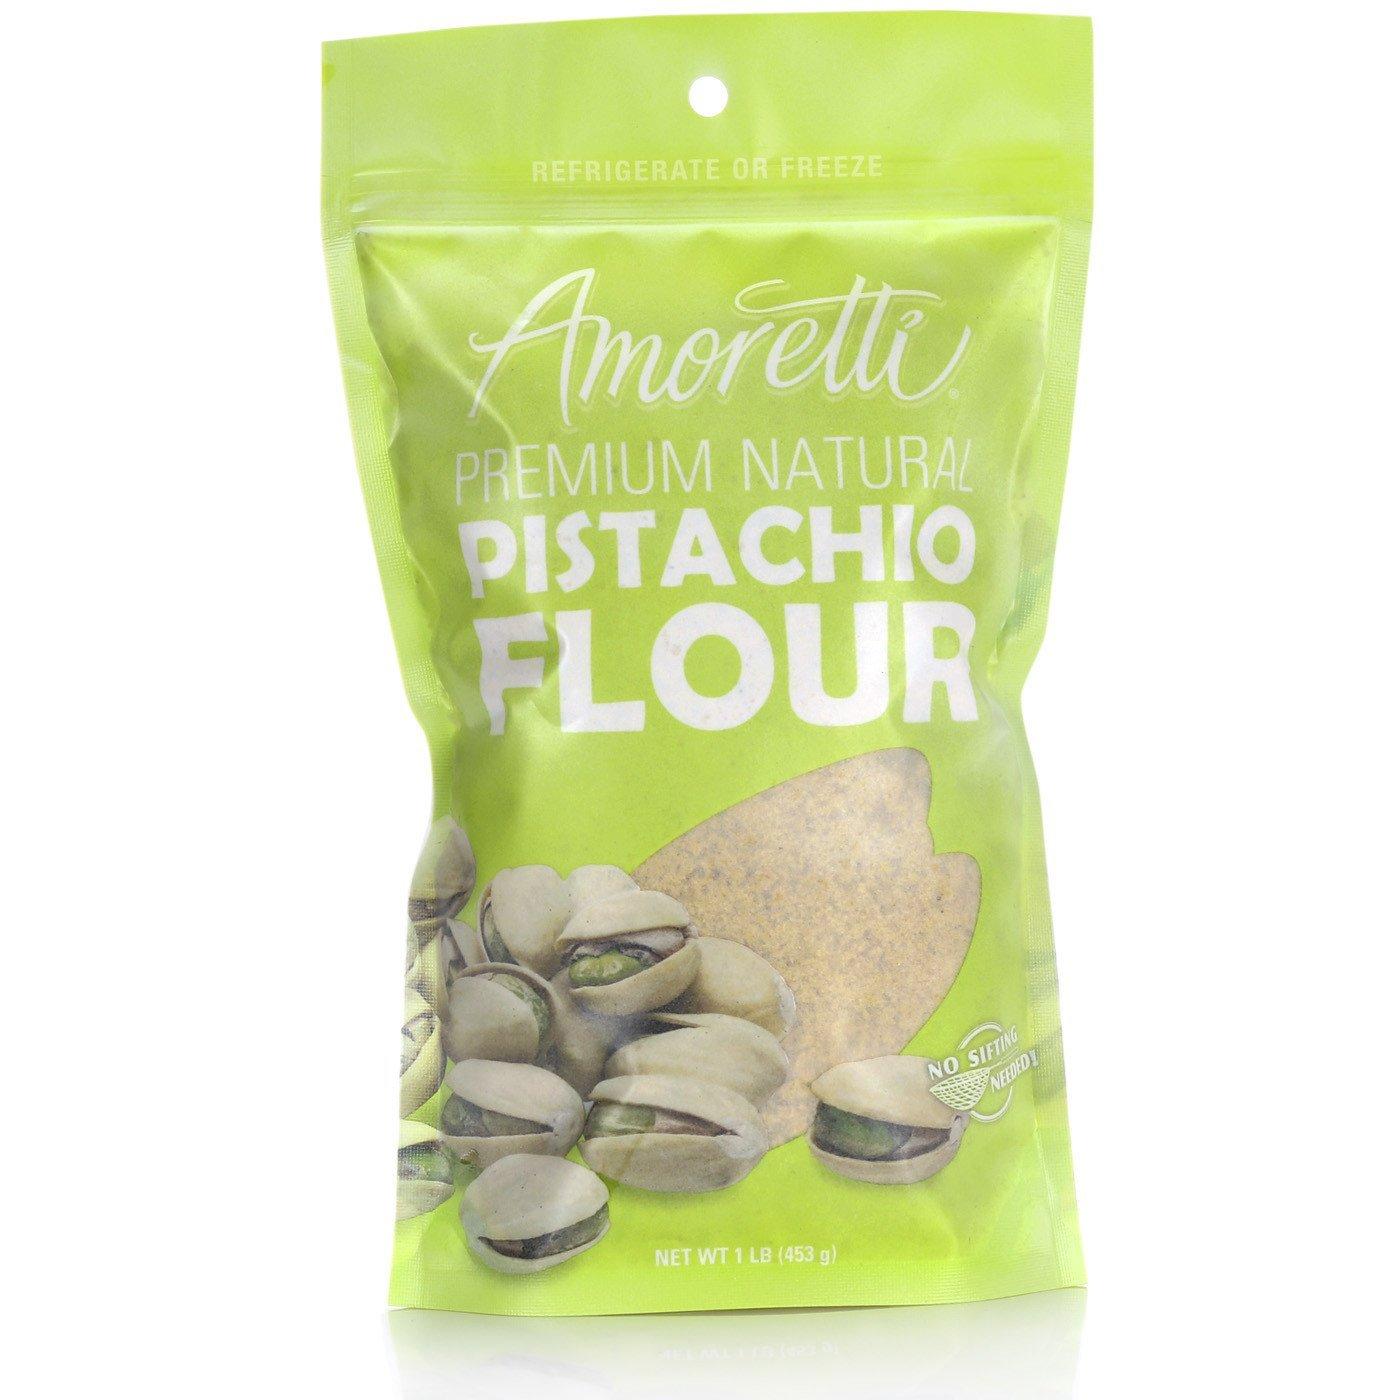 Natural Pistachio Flour Raw Pistachios Pistachio Savoury Dishes